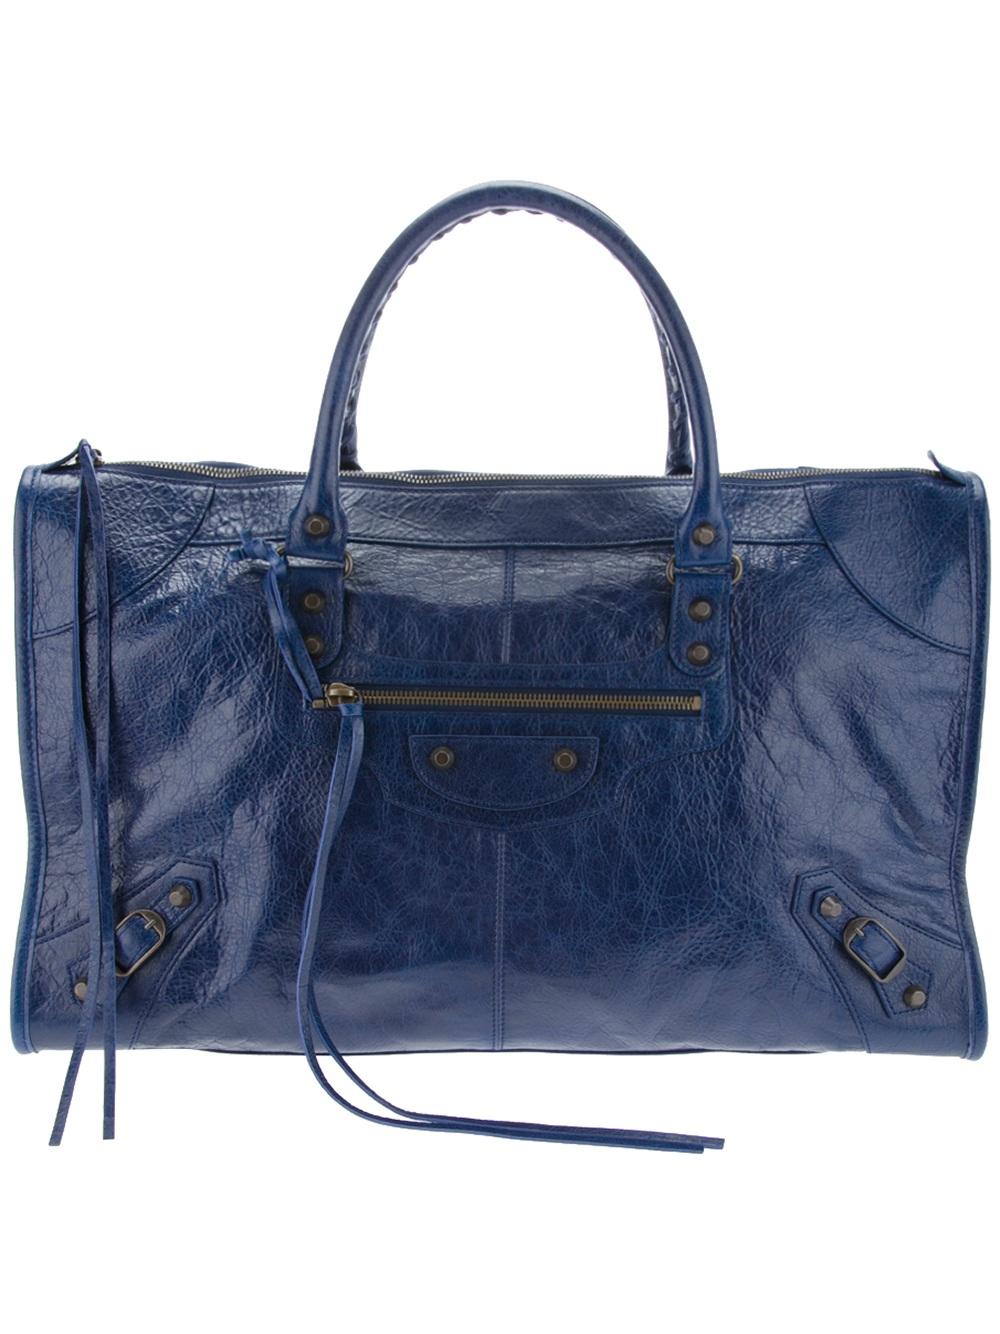 Balenciaga Everyday Xs Metallic Leather Tote in Metallic